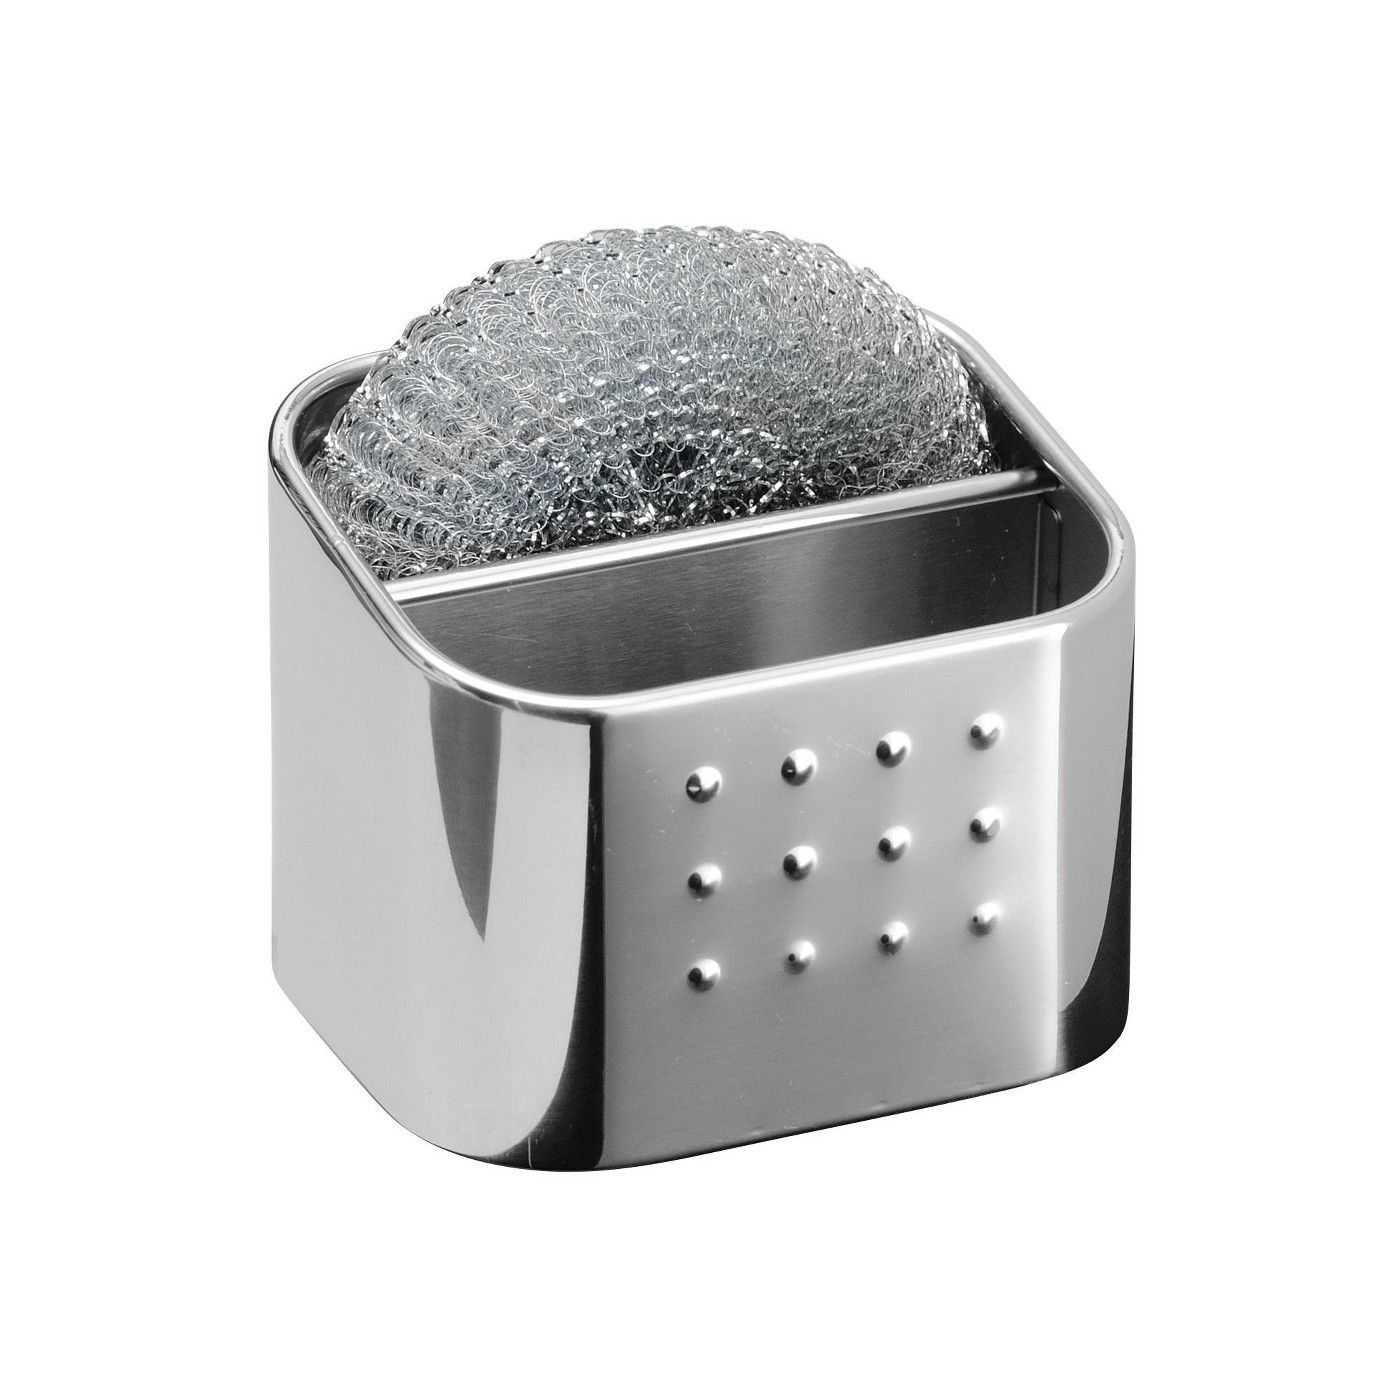 Interdesign Forma Stainless Steel Scrub Hub Sponge Caddy Polished Sponge Caddy Interdesign Polished Steel